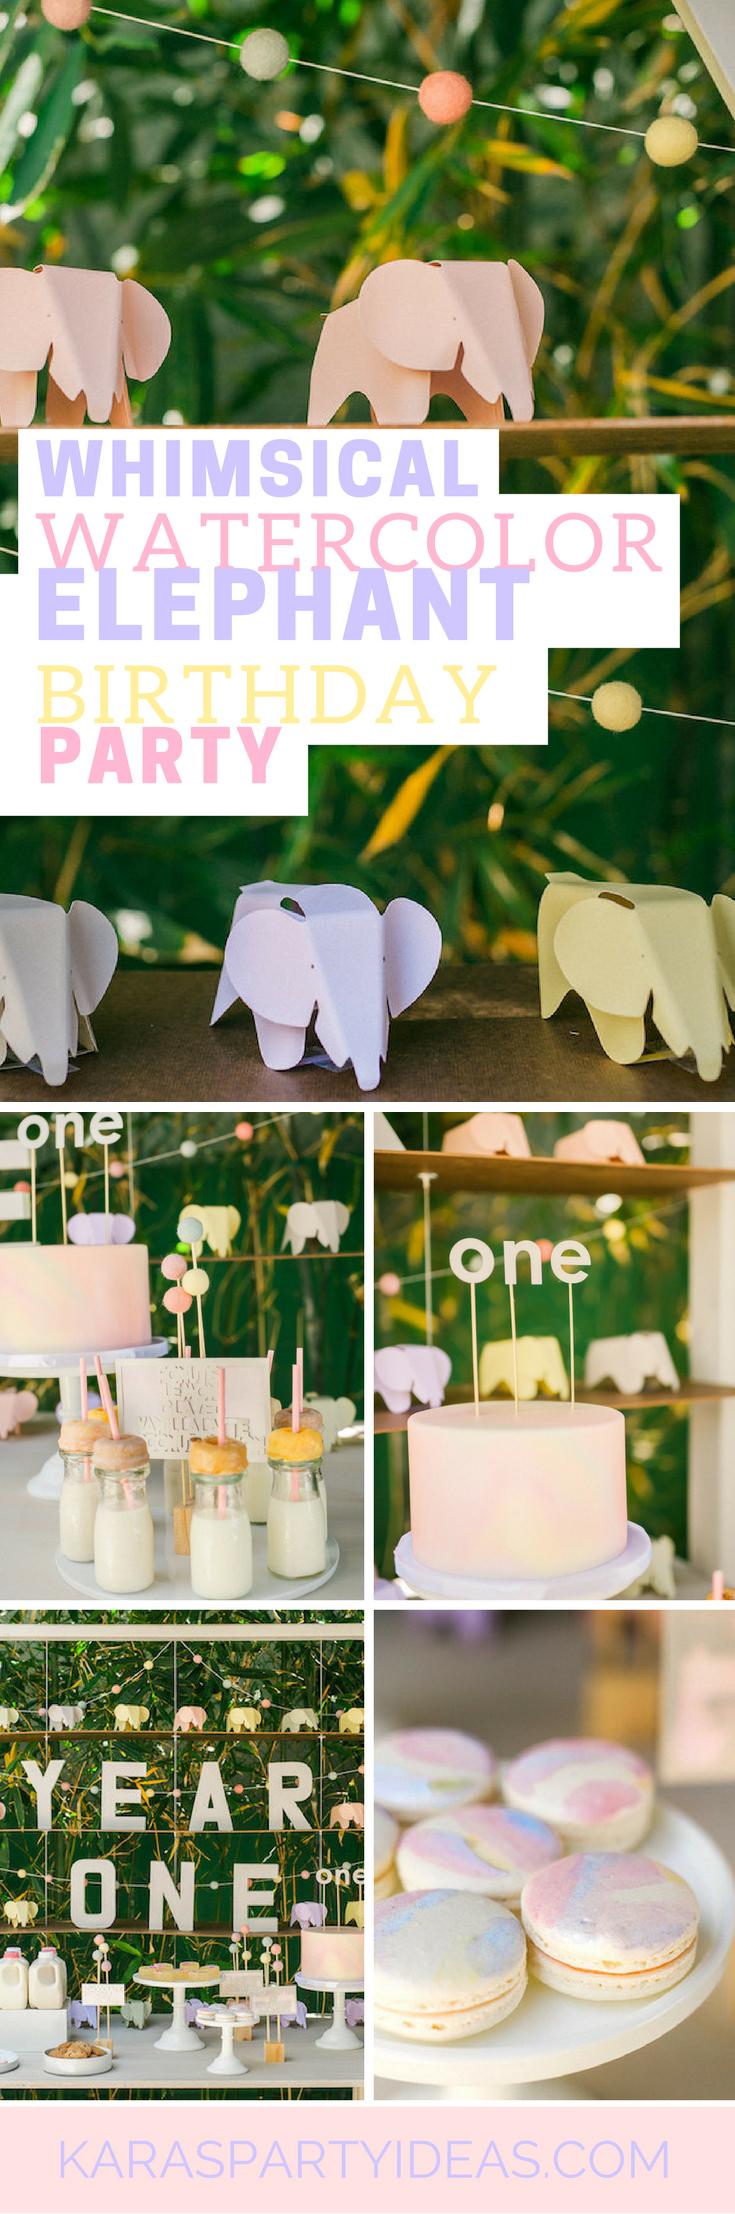 Kara S Party Ideas Whimsical Watercolor Elephant Birthday Party Kara S Party Ideas